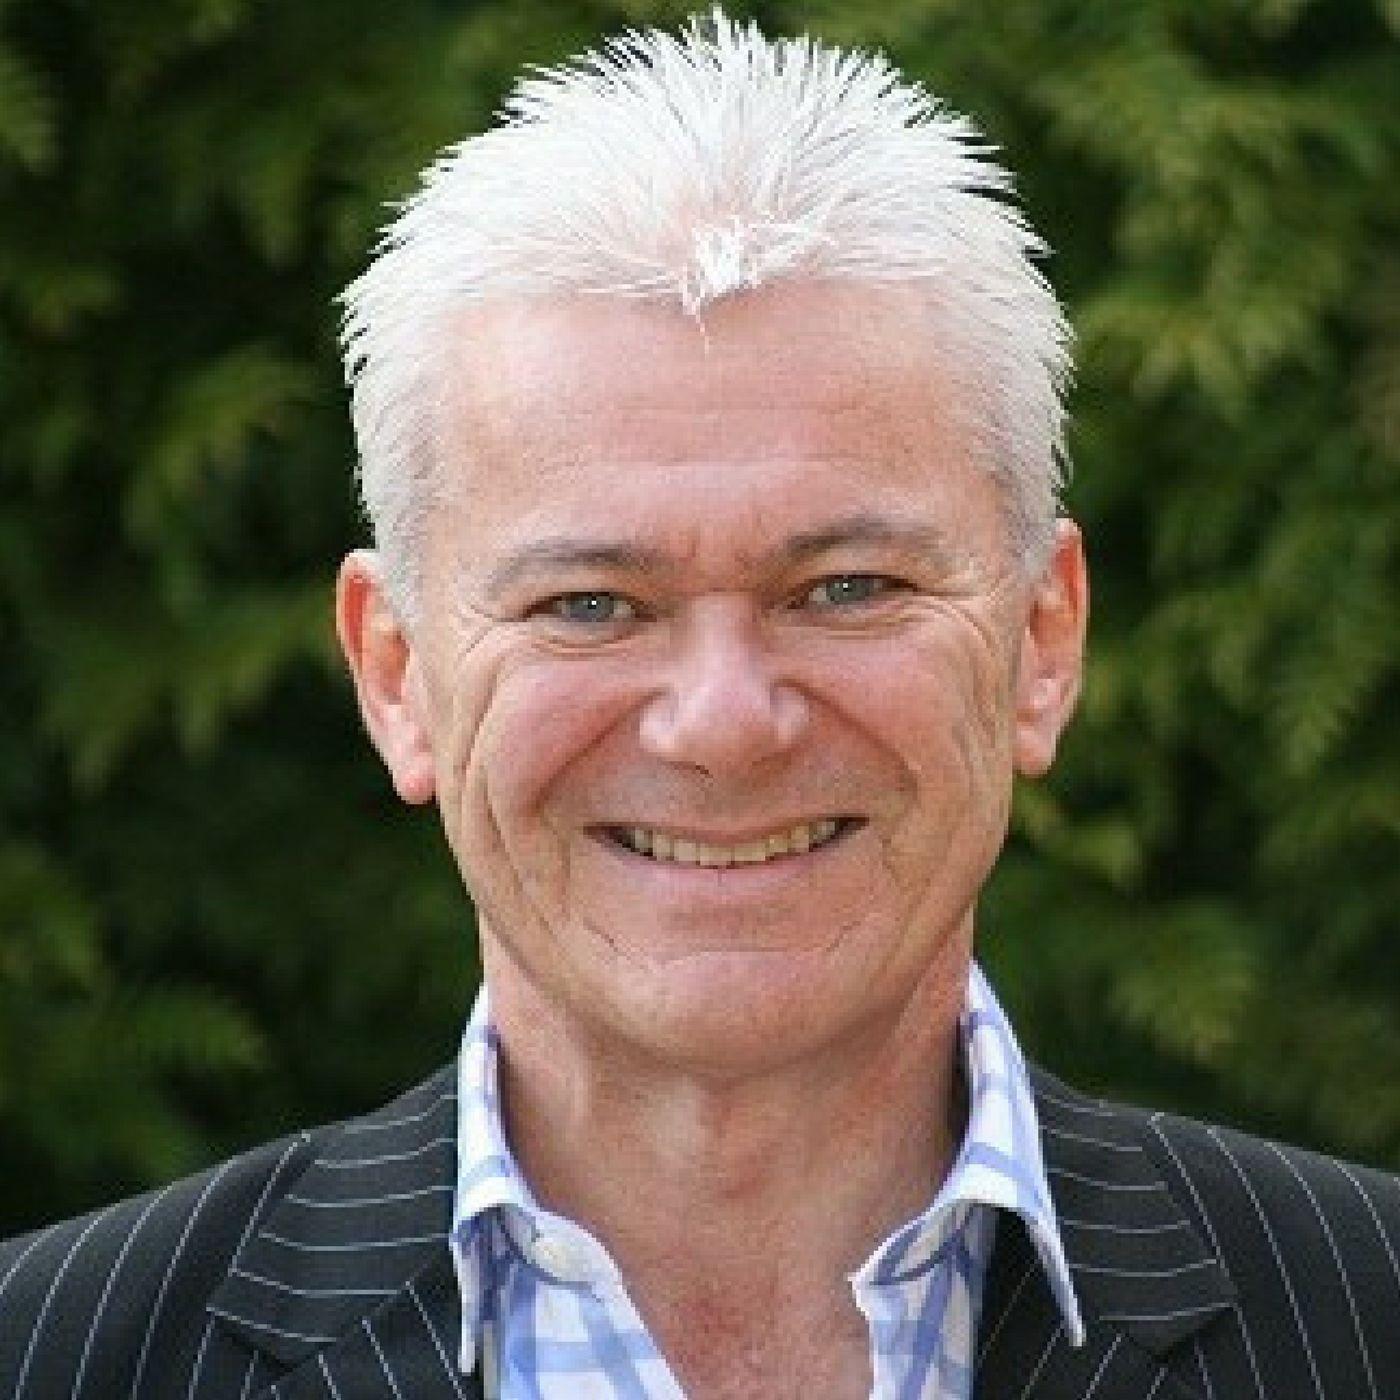 Dr. Simon Meager